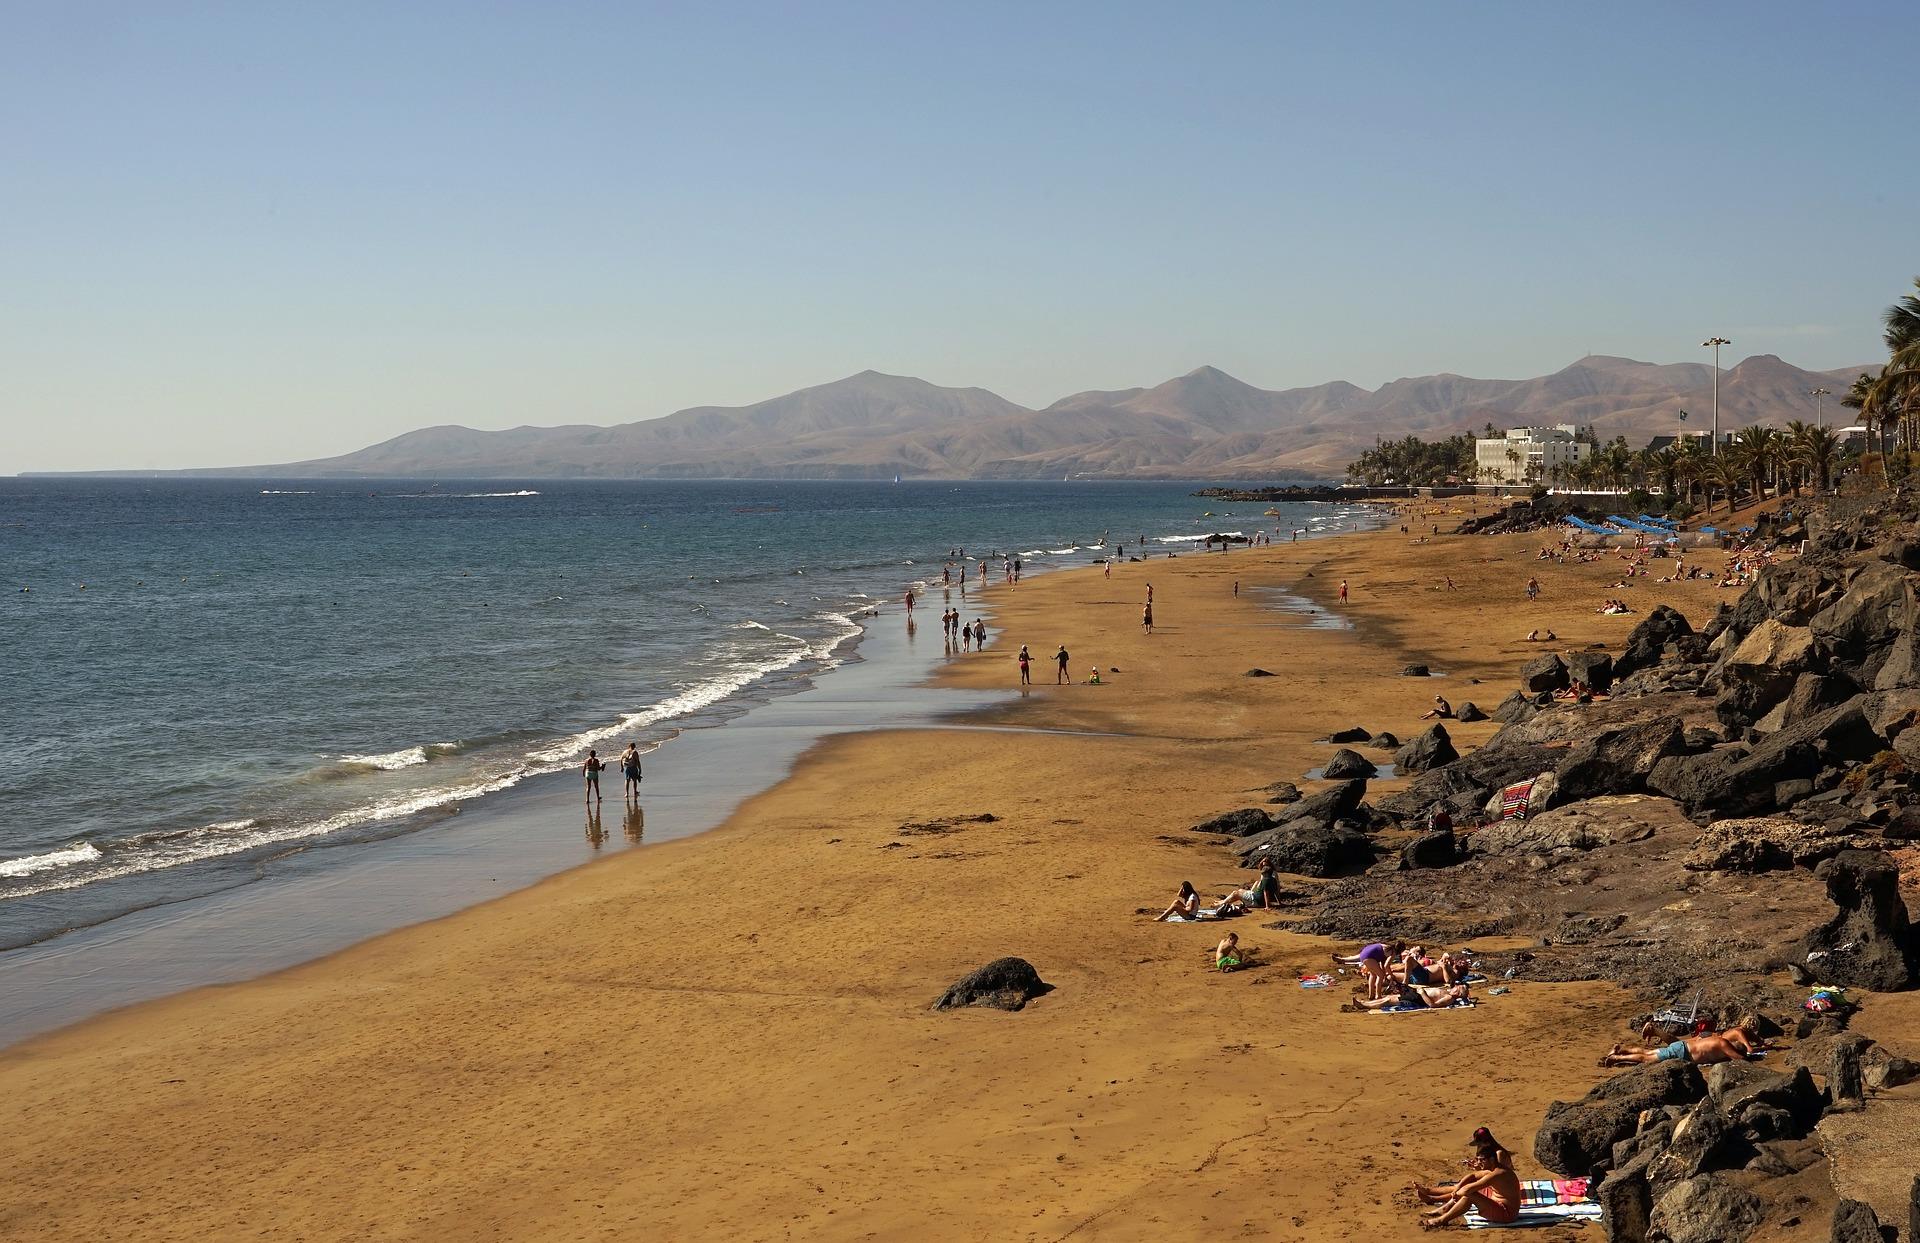 Plage du littoral de Puerto del Carmen sur l'île de Lanzarote